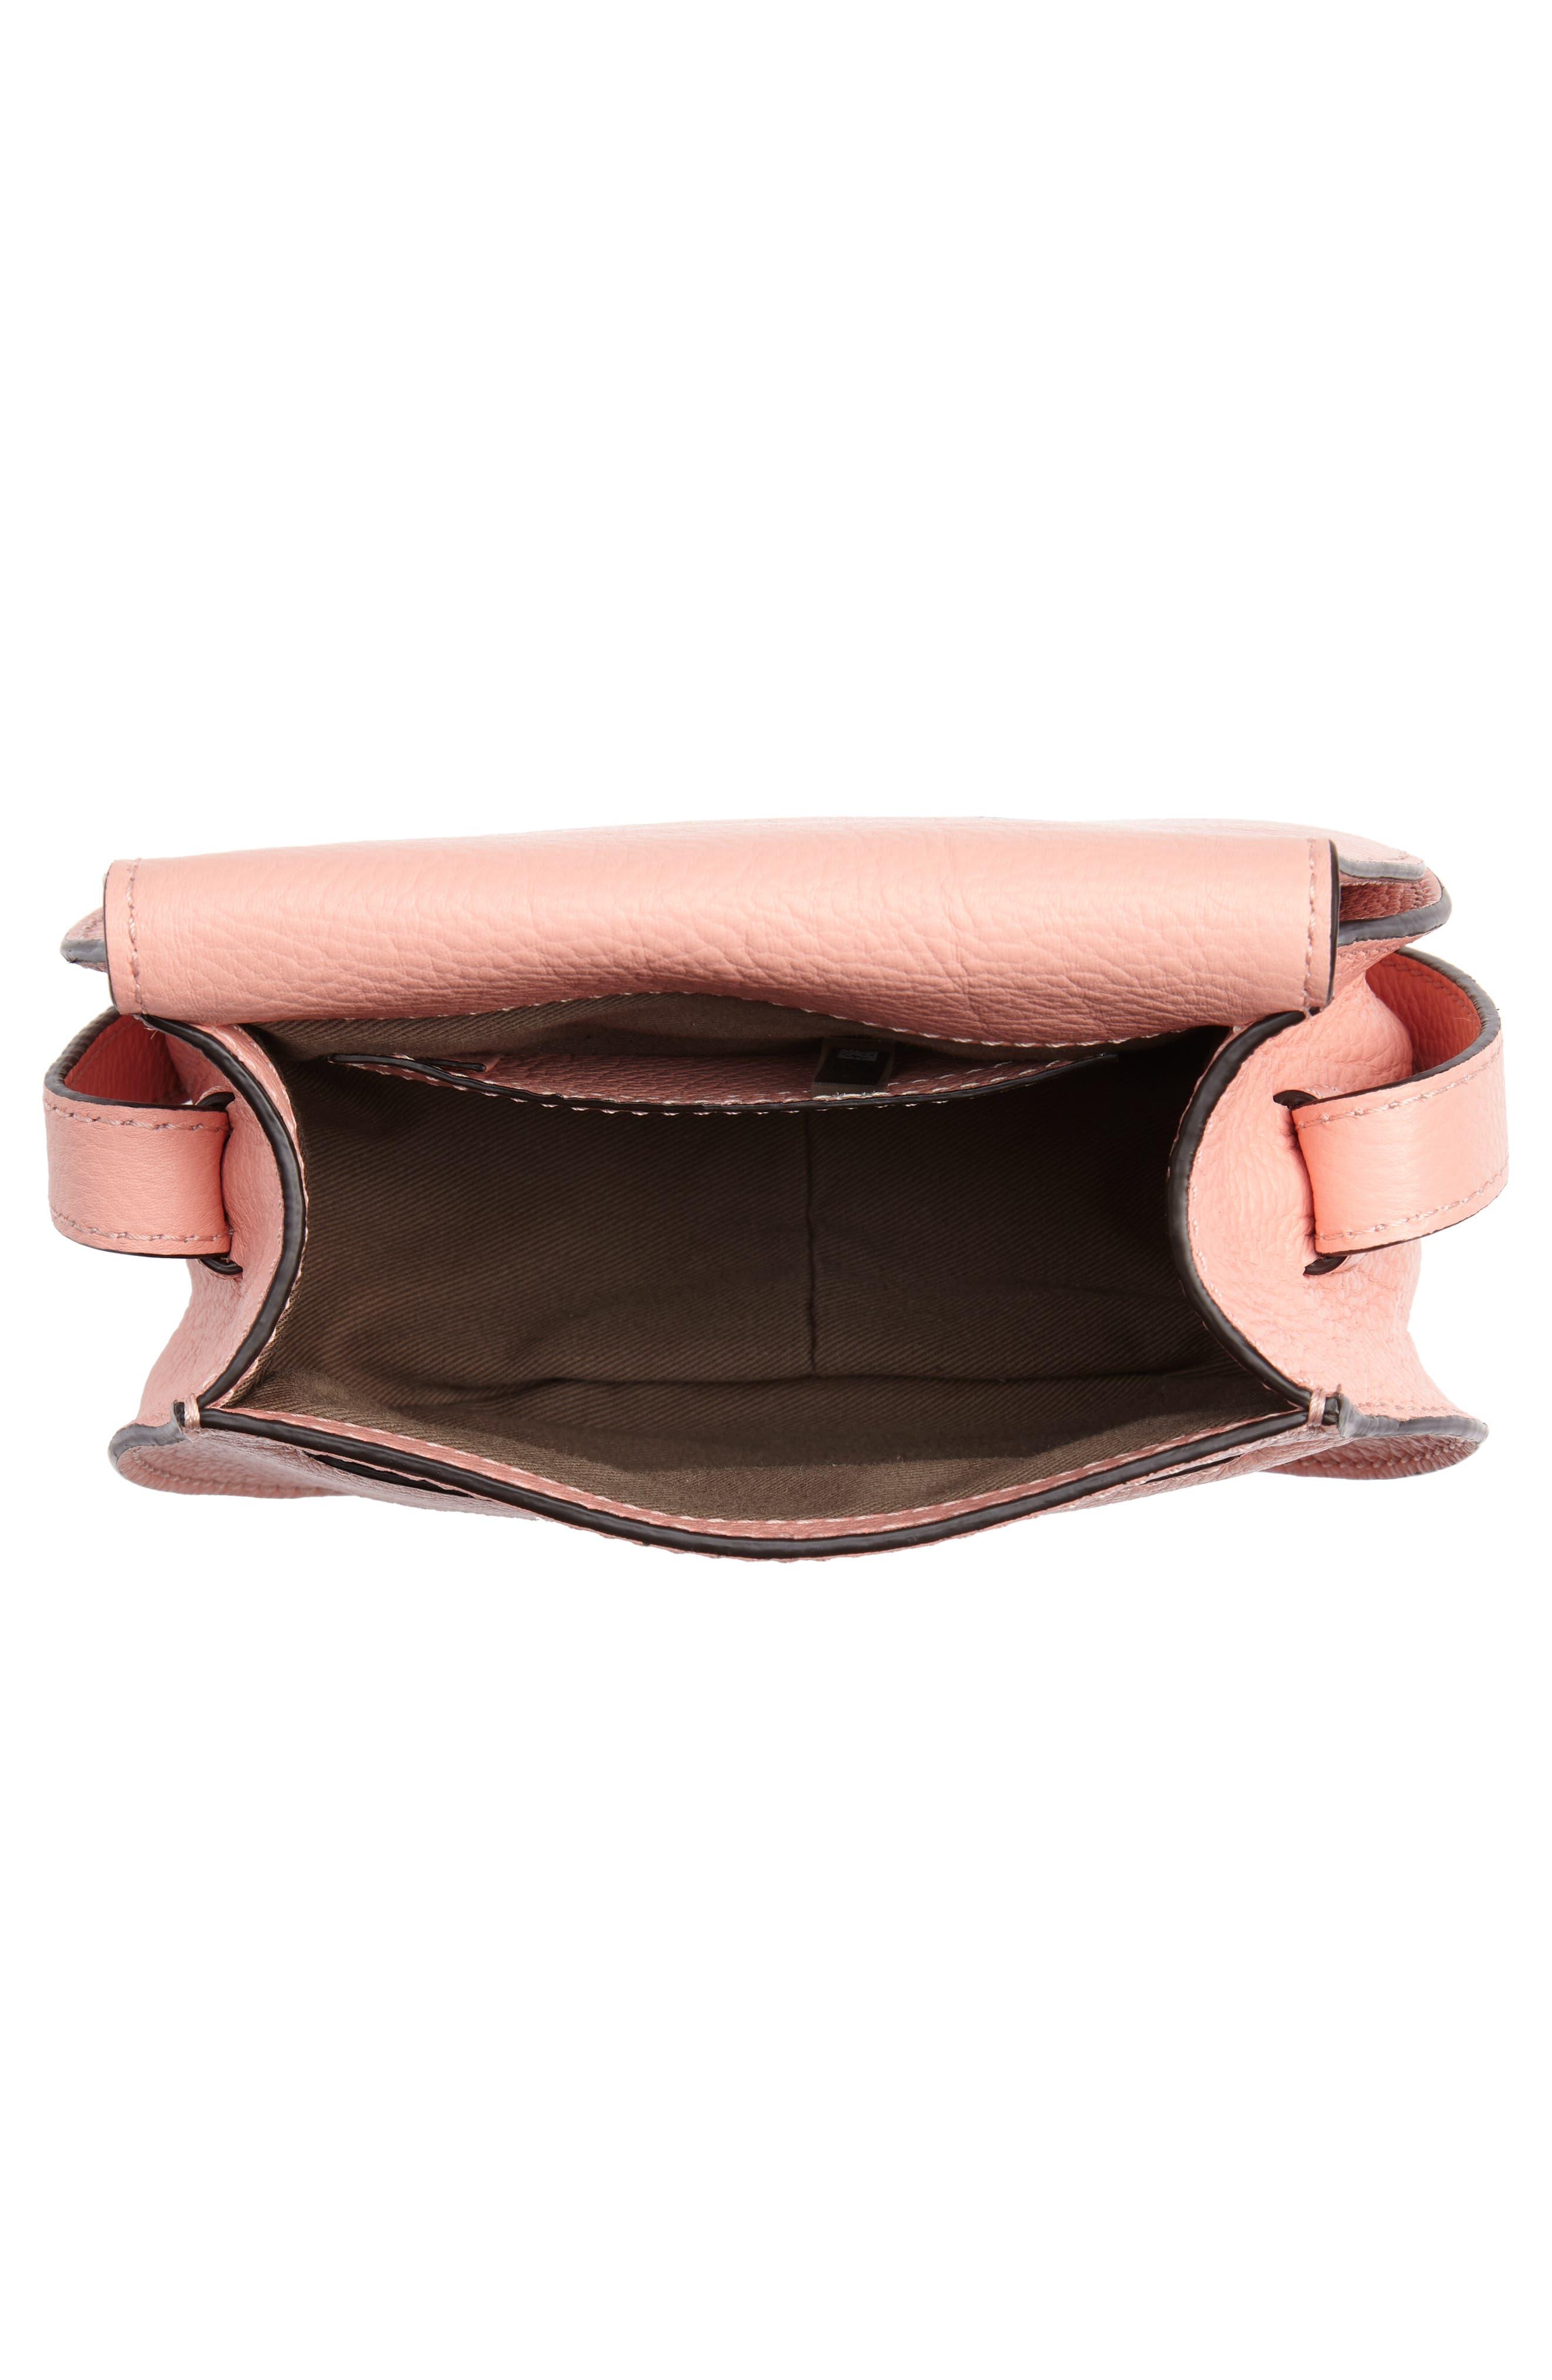 'Mini Marcie' Leather Crossbody Bag,                             Alternate thumbnail 4, color,                             Ideal Blush